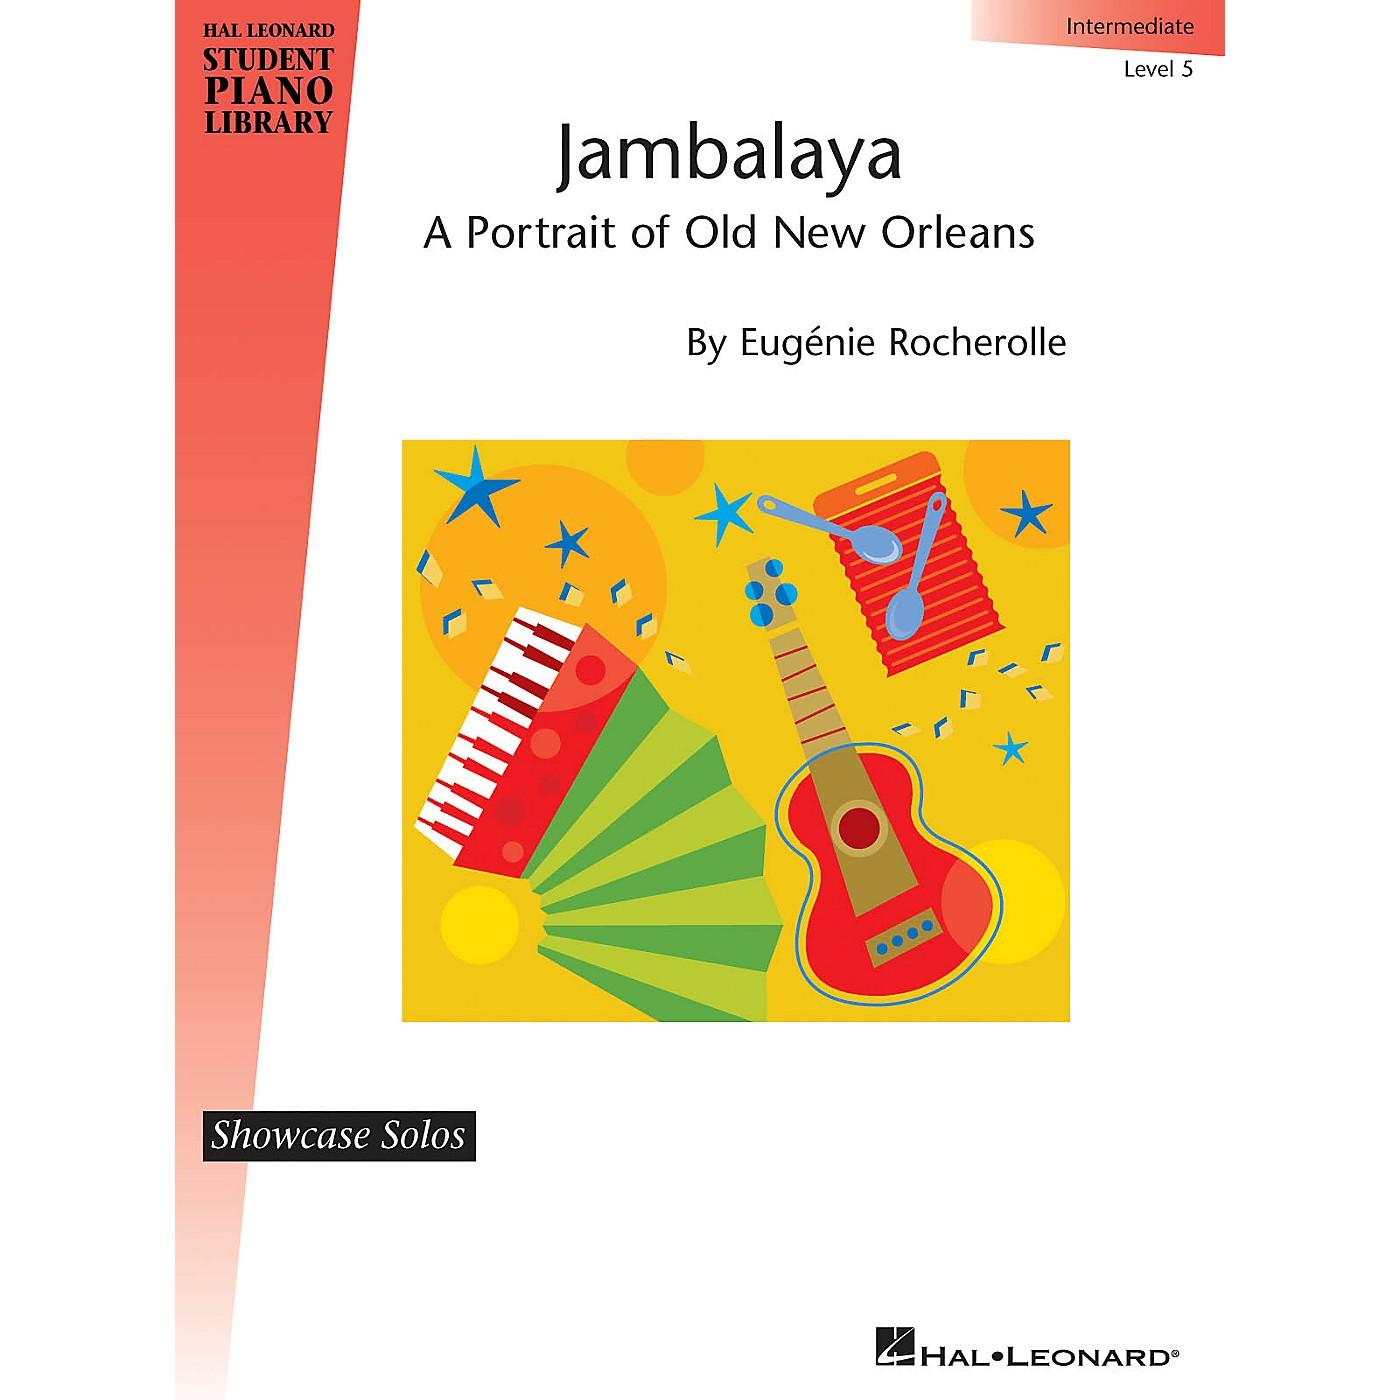 Hal Leonard Jambalaya Piano Library Series by Eugénie Rocherolle (Level Inter) thumbnail